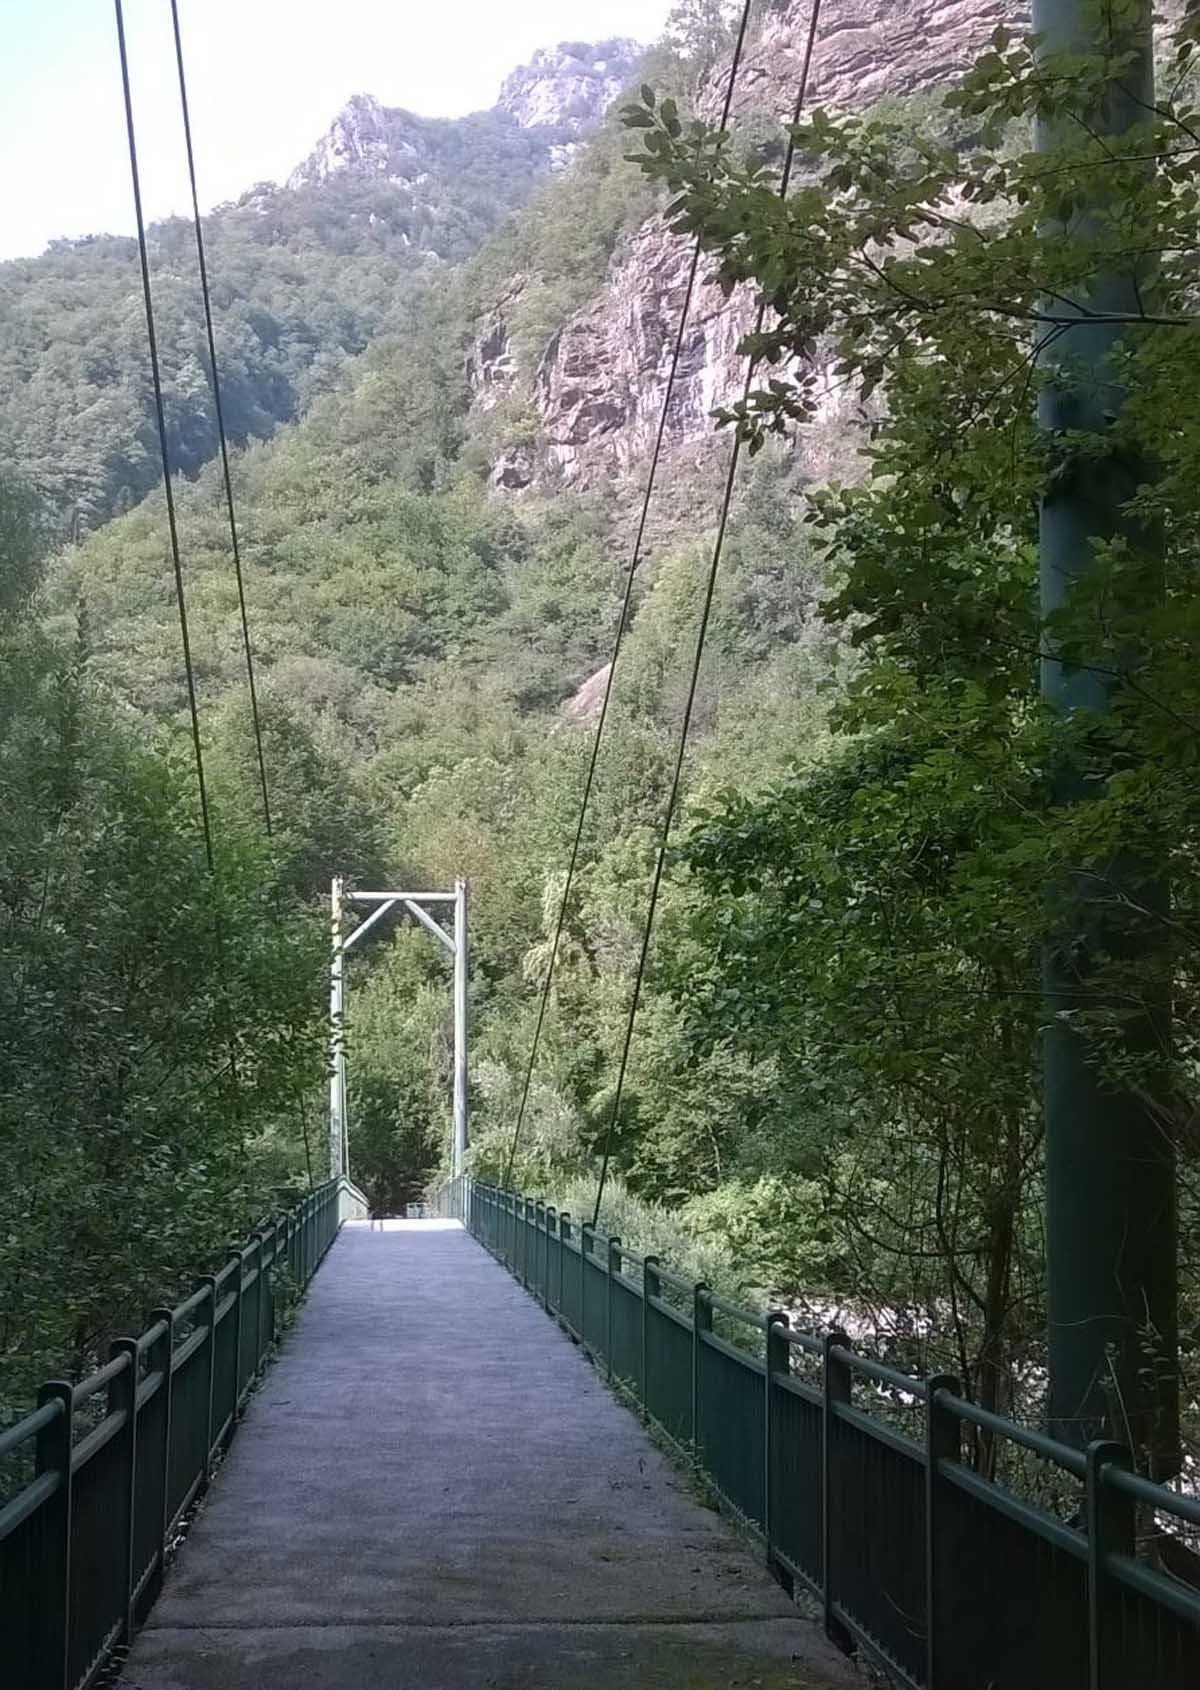 Ponte sul Soana a Cavagnole